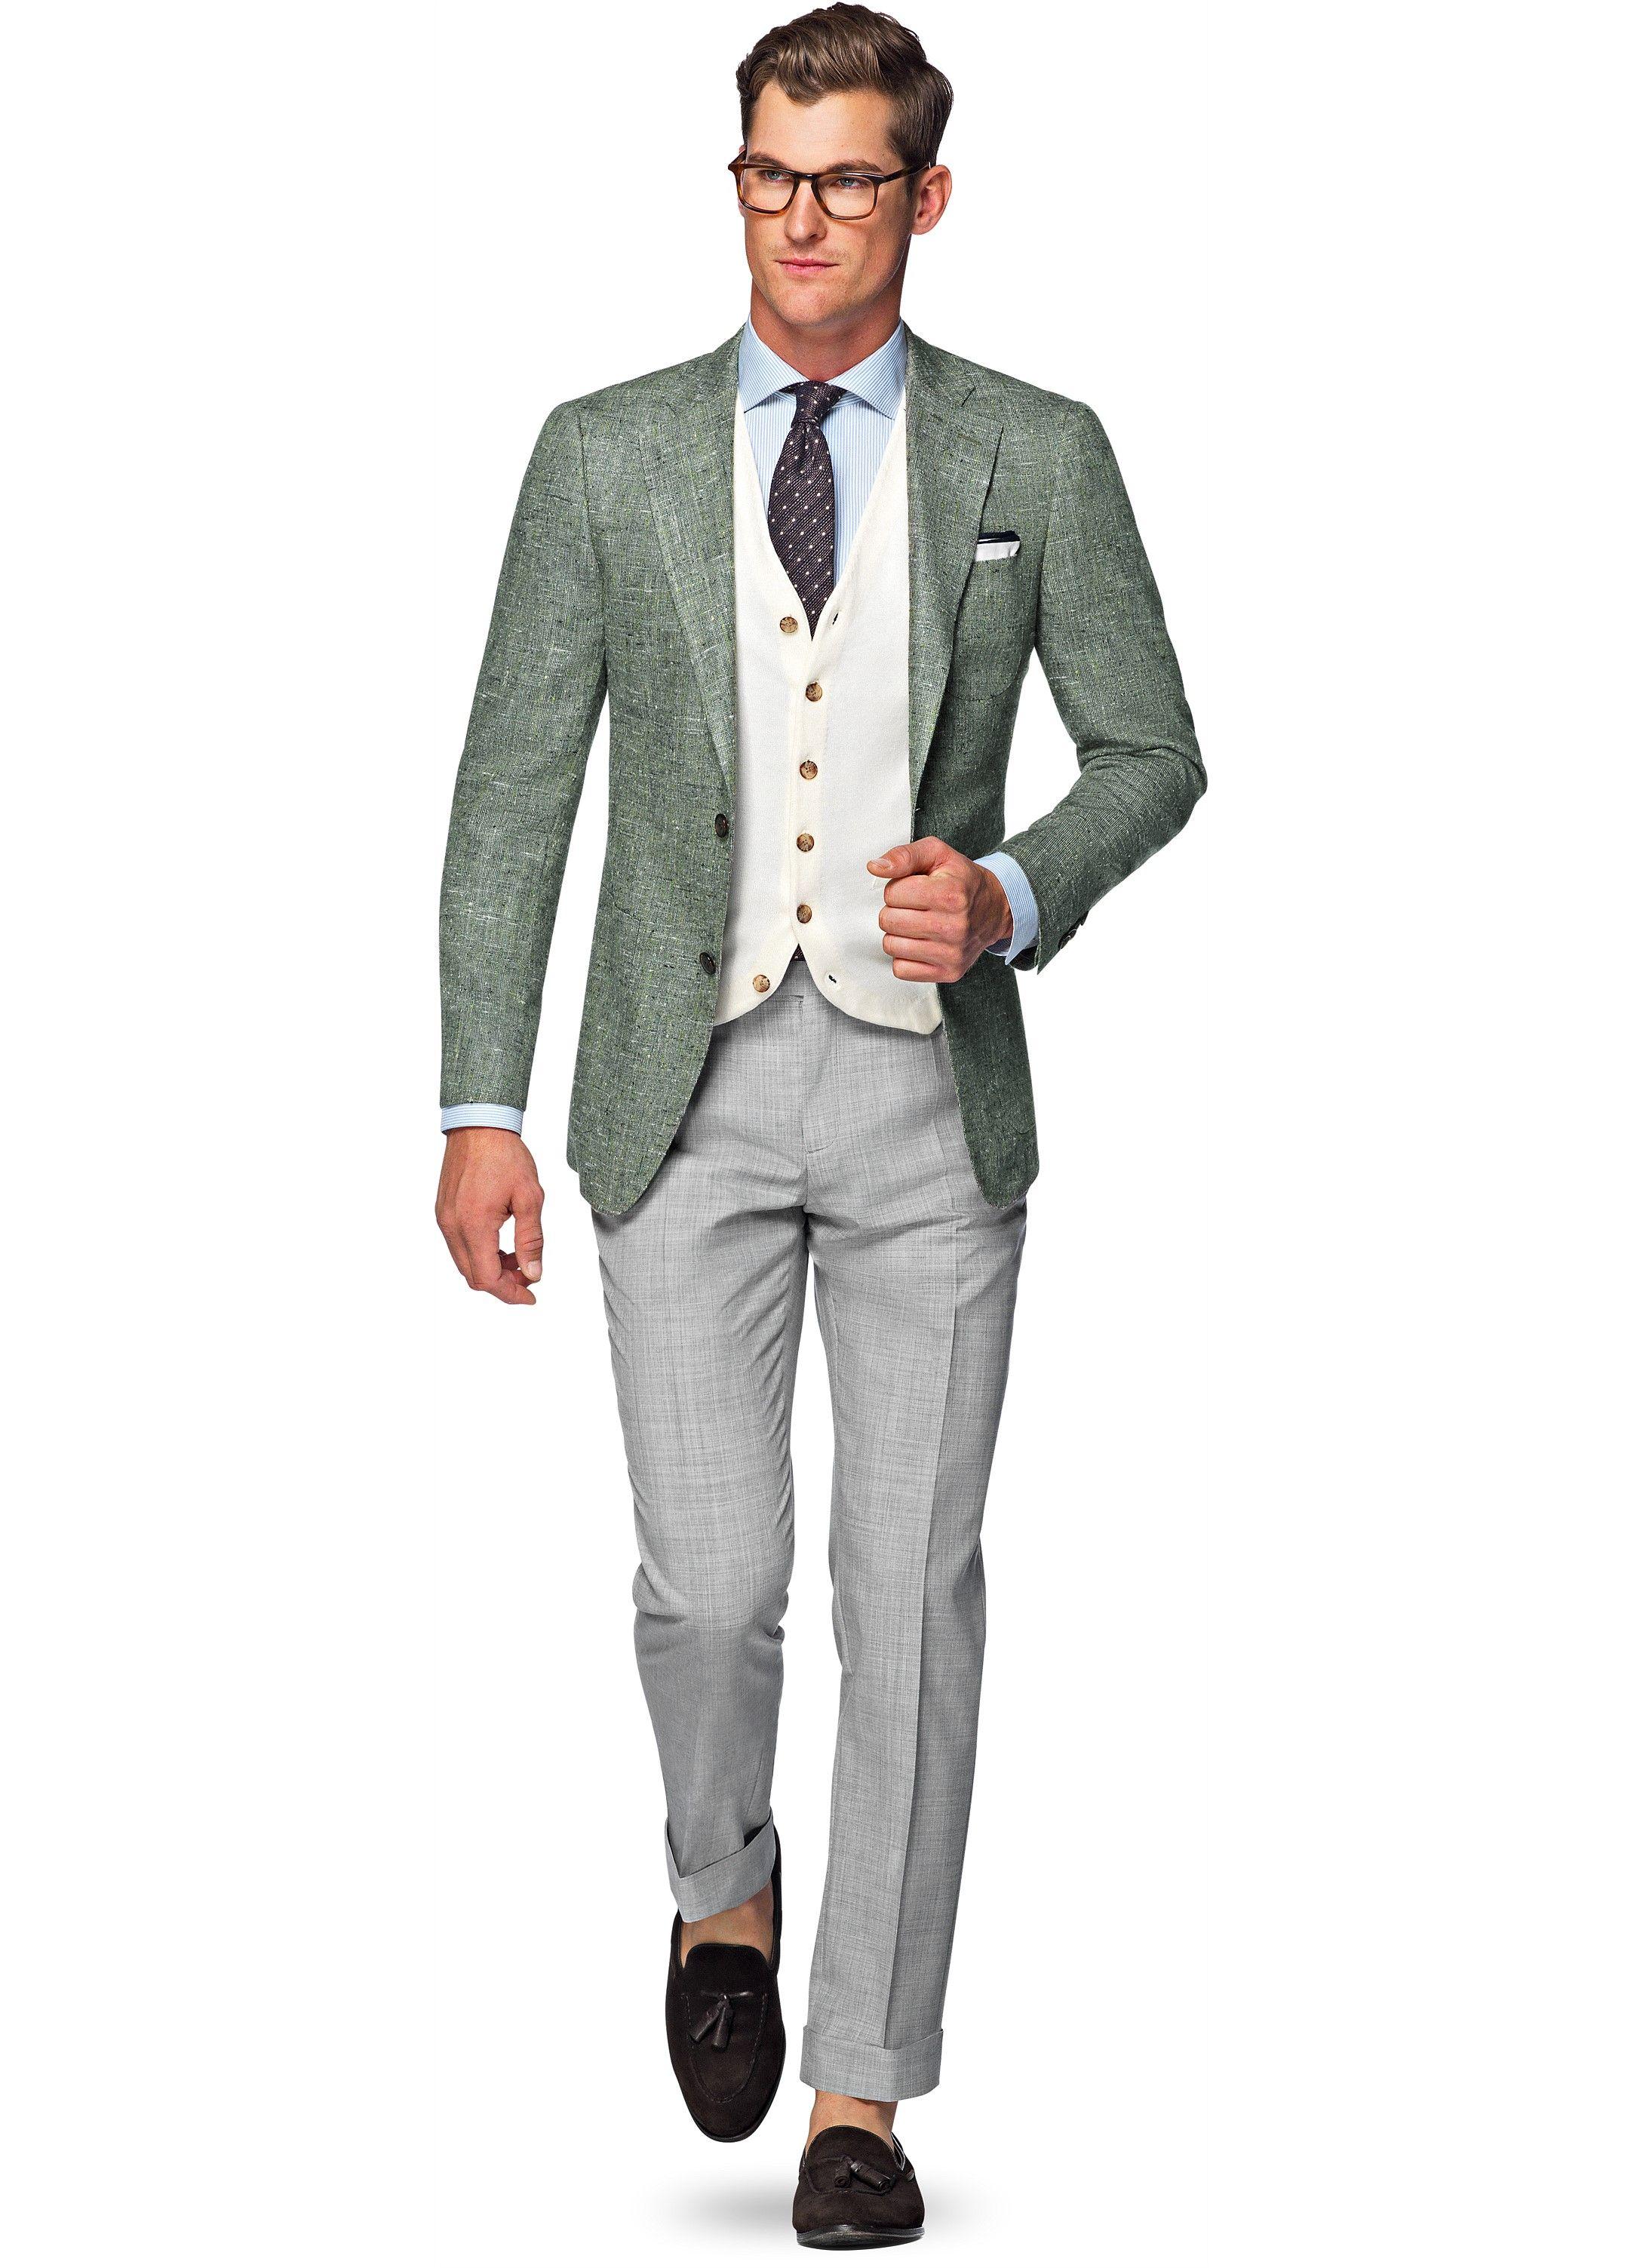 Fonkelnieuw Jacket Green Plain Hudson C944i   Suitsupply Online Store   I OF-29